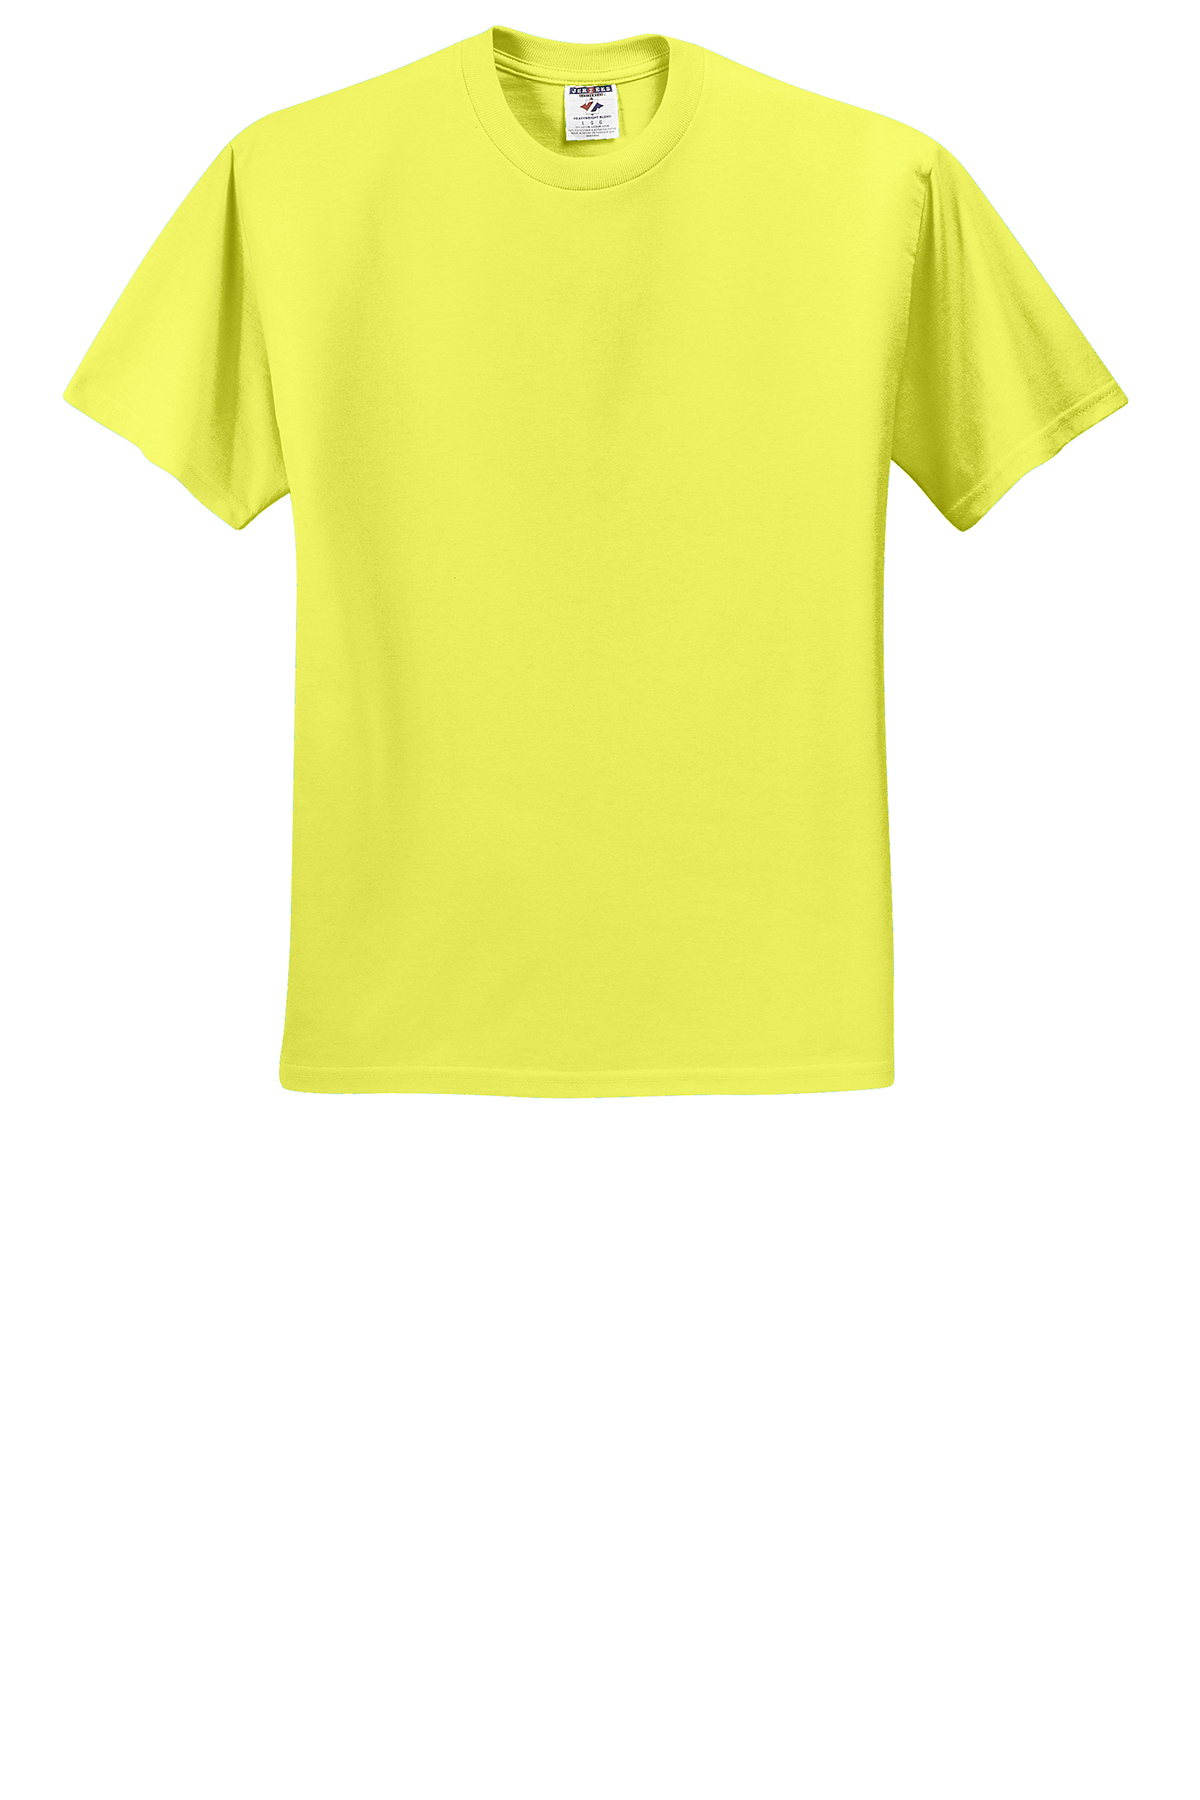 jerzees dri power active 50 50 cotton poly t shirt 50 50 blend